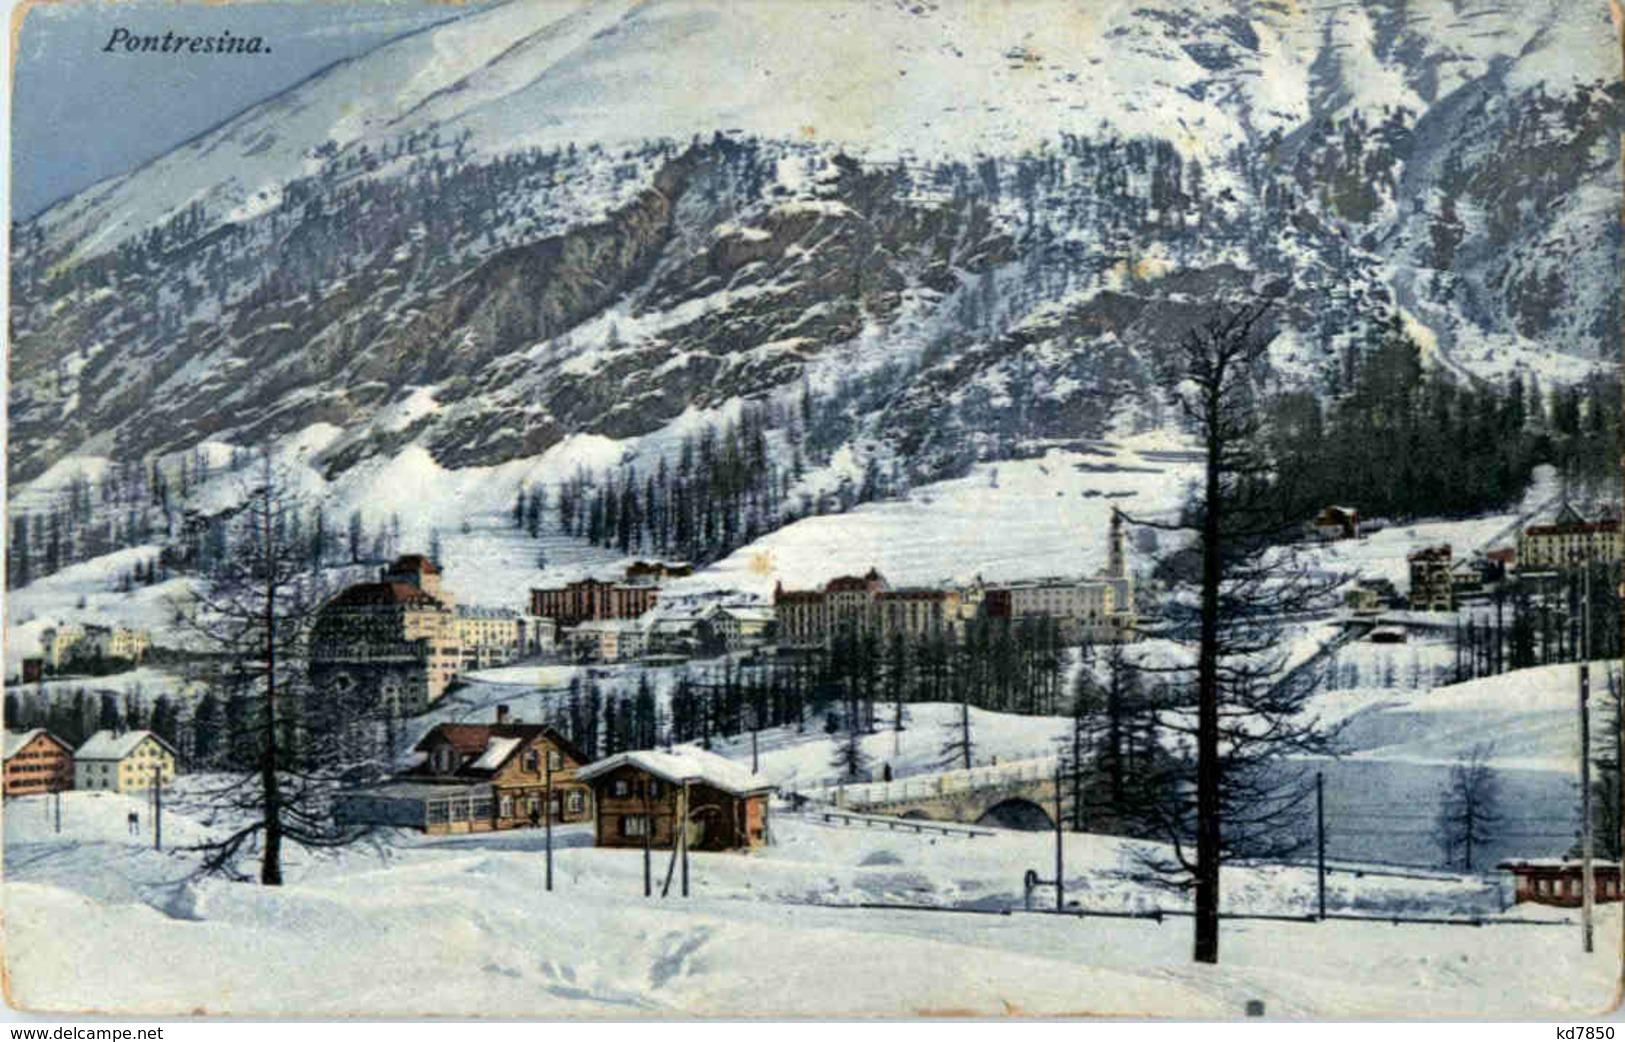 Pontresina - GR Graubünden